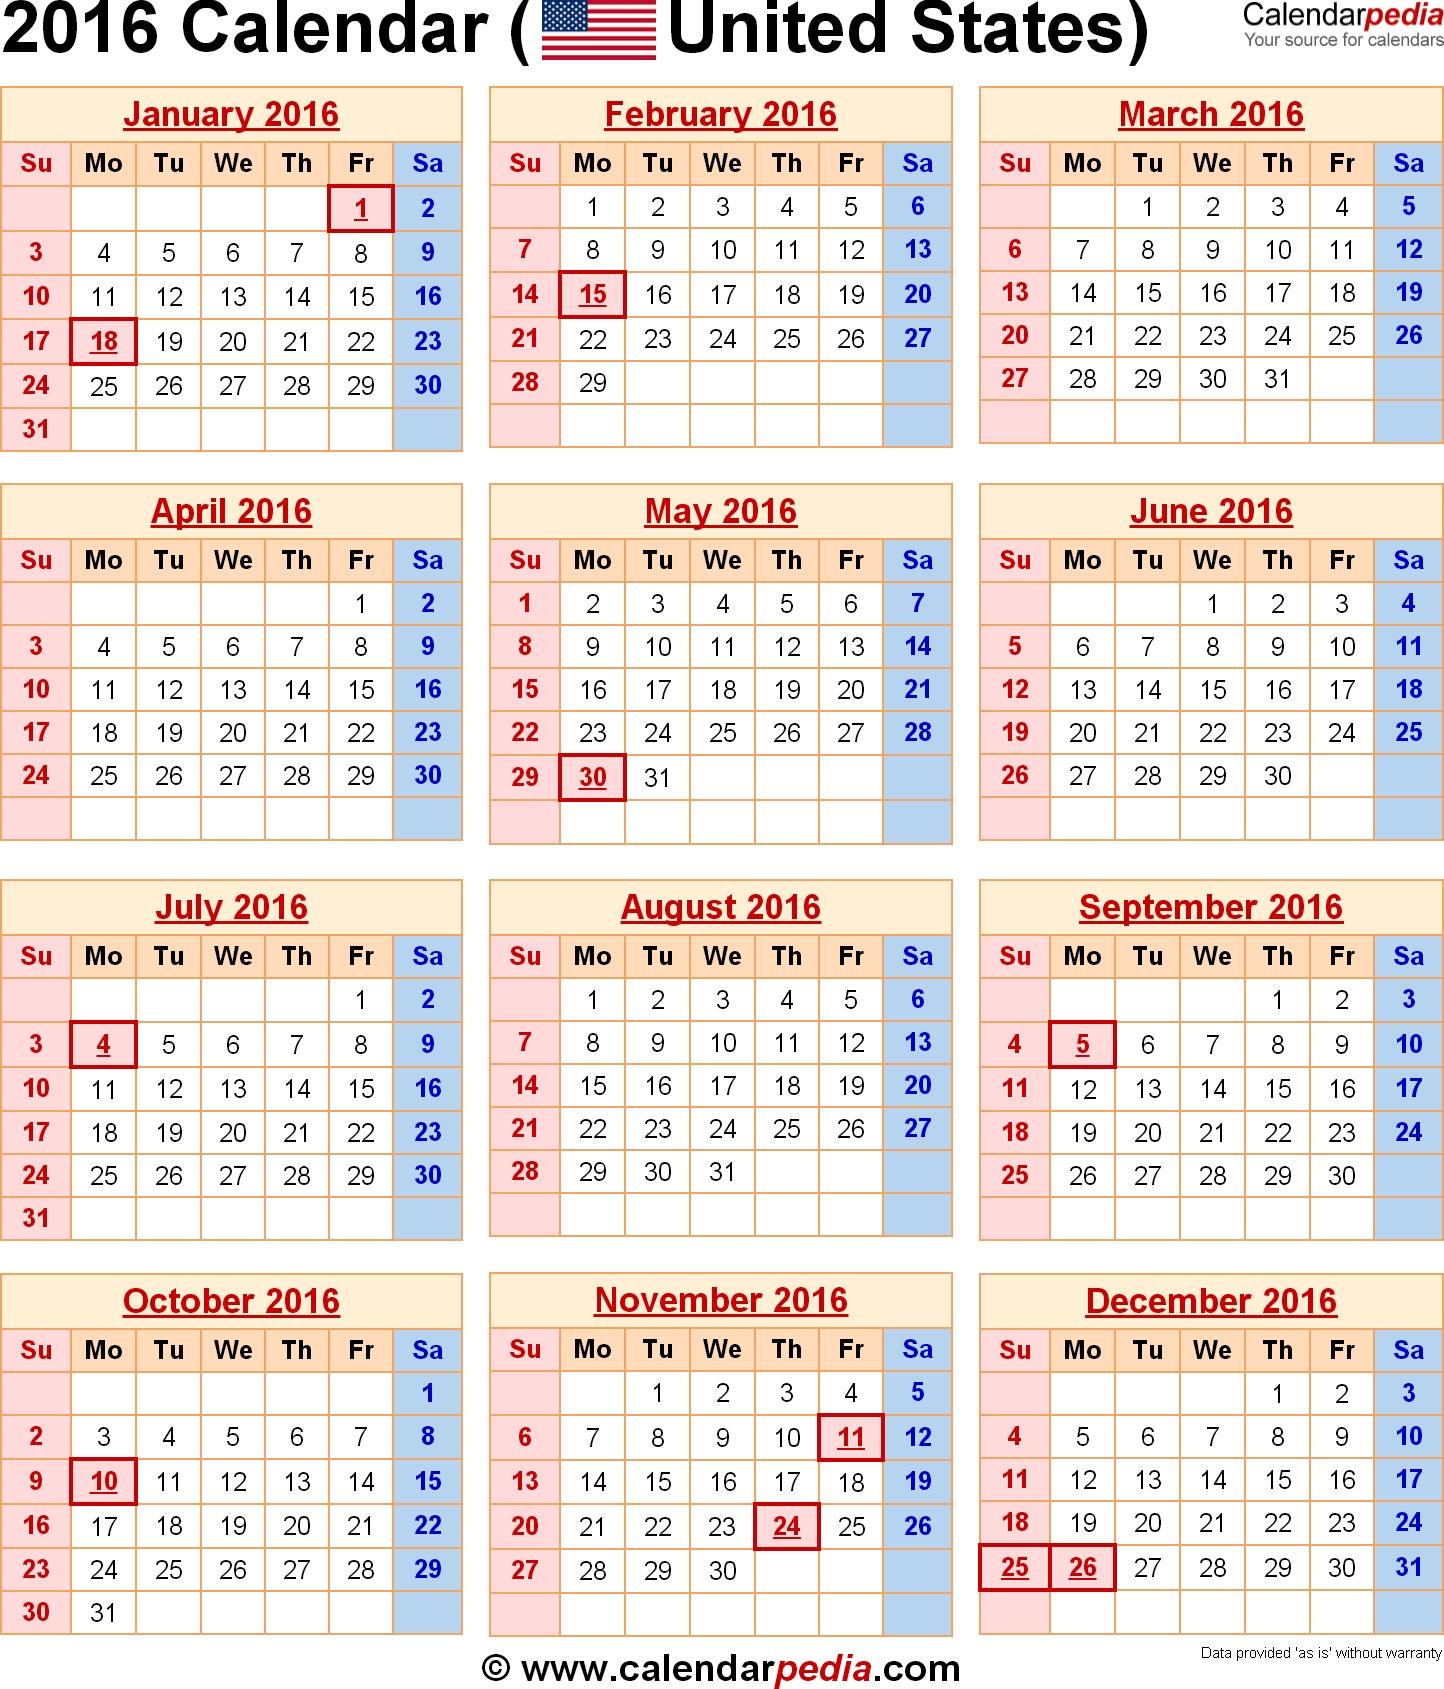 2016 Calendar With Federal Holidays & Excel/Pdf/Word